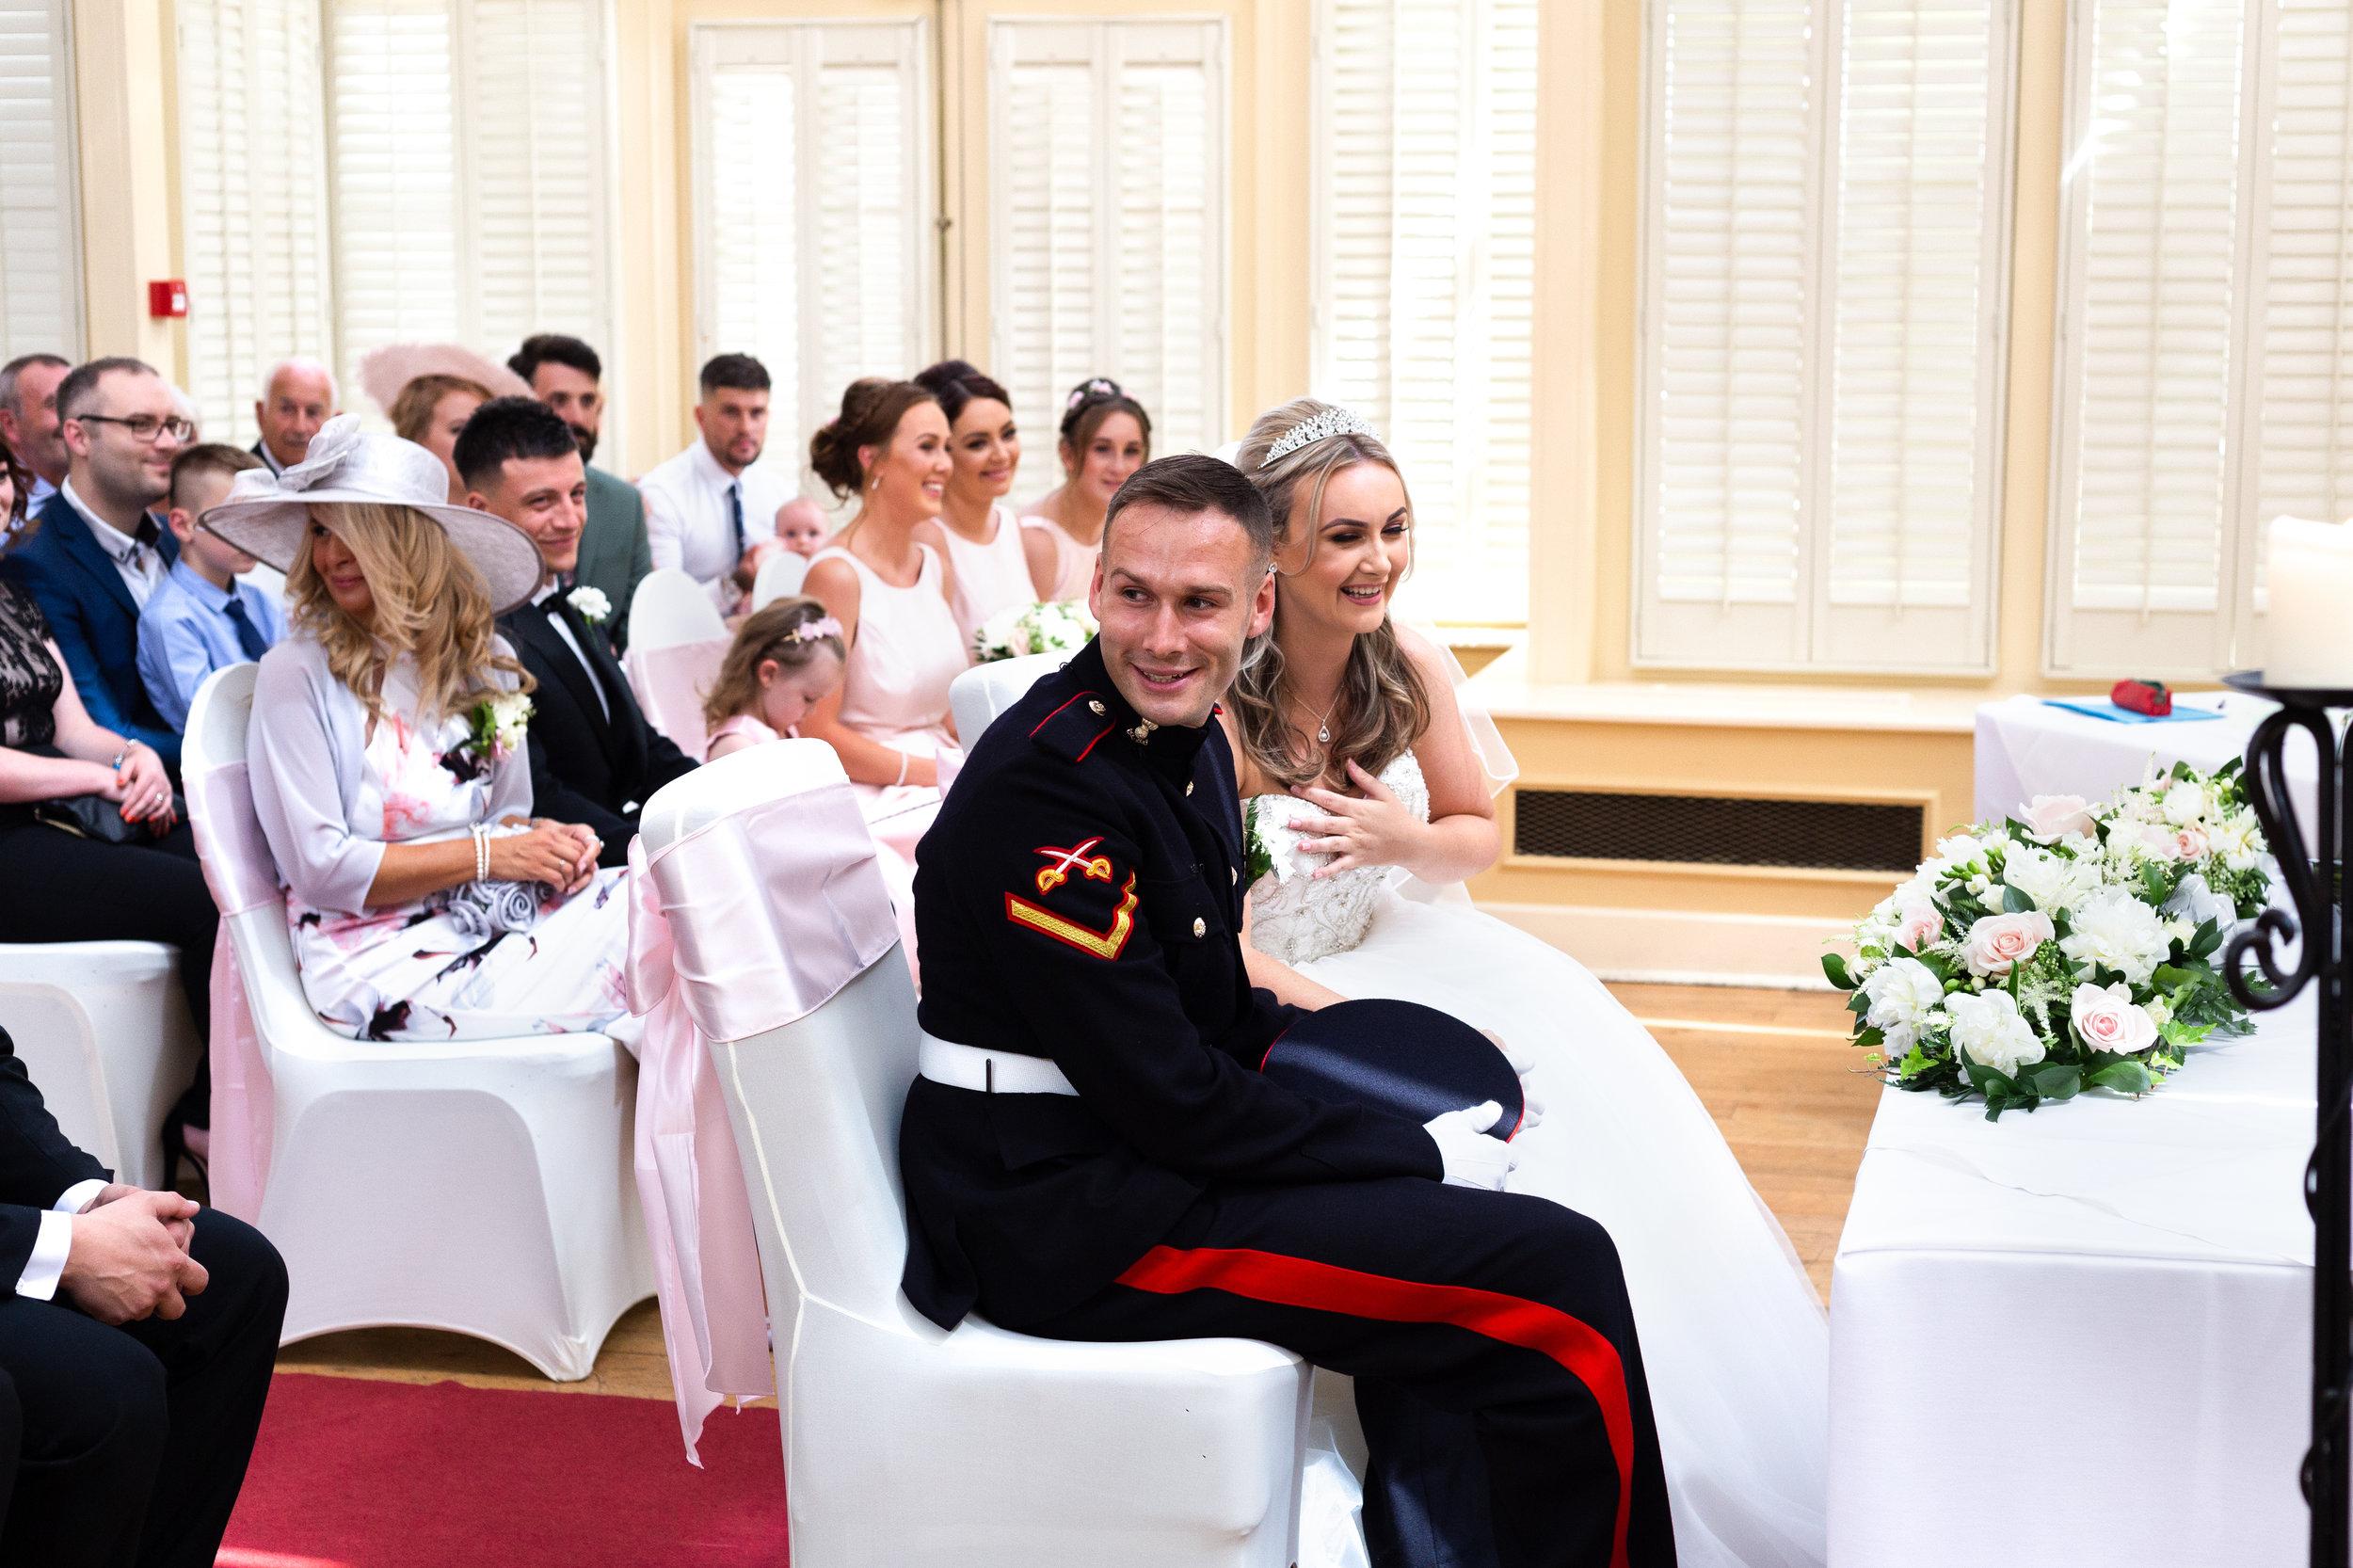 wedding-lea-cooper-photography-willenhall-west-midlands-wolverhampton-dudley-birmingham-uk-marriage-hadley-park-east-telford-getting-married.jpg